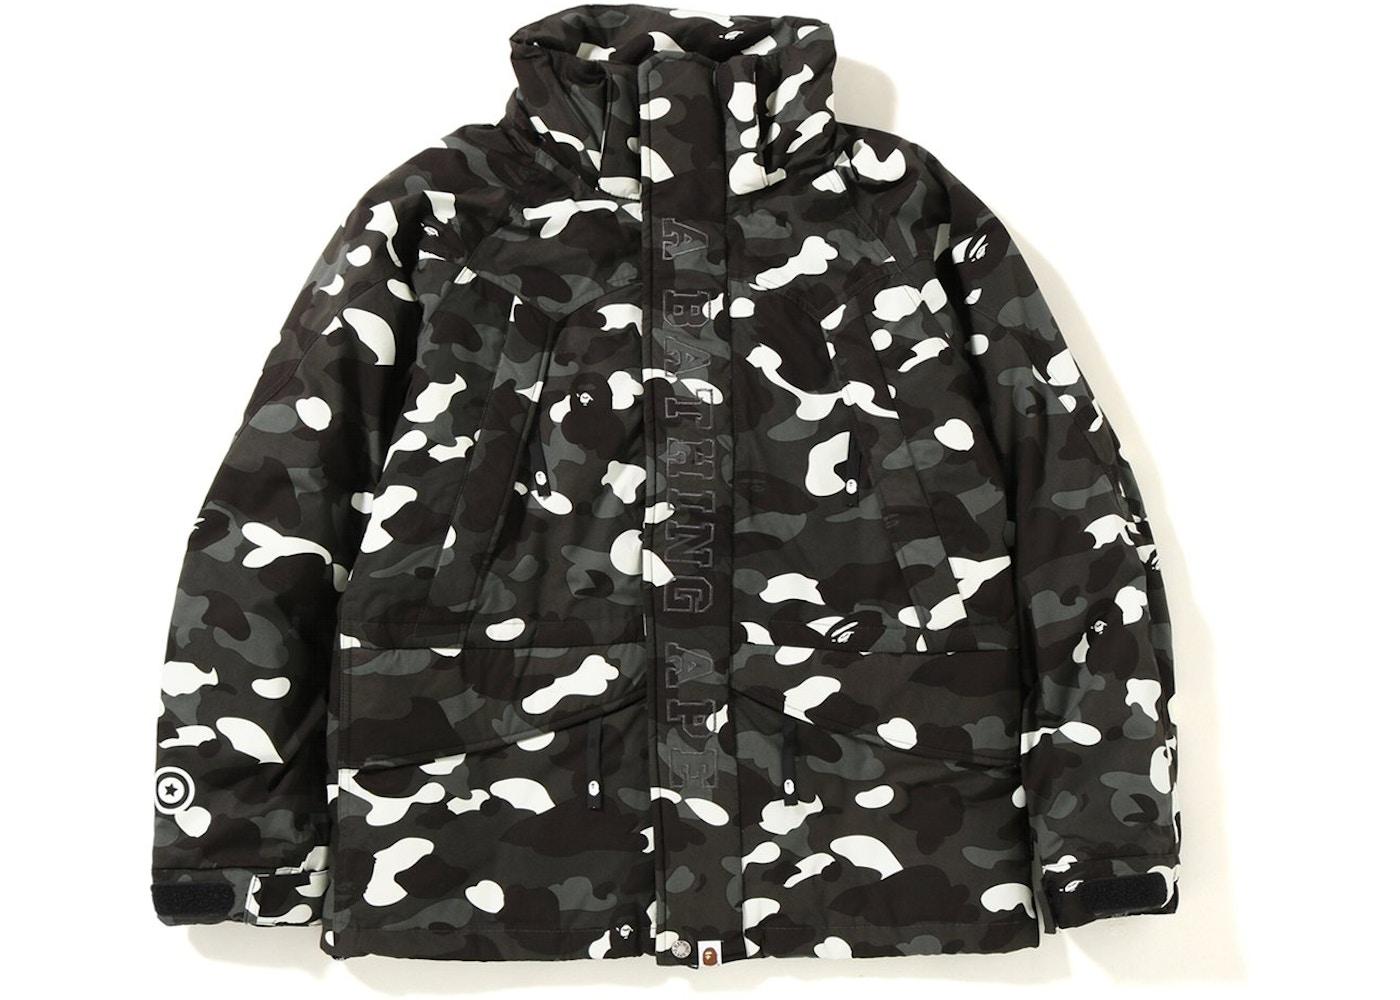 cafb5dd6c76f Buy   Sell Bape Streetwear - Average Sale Price